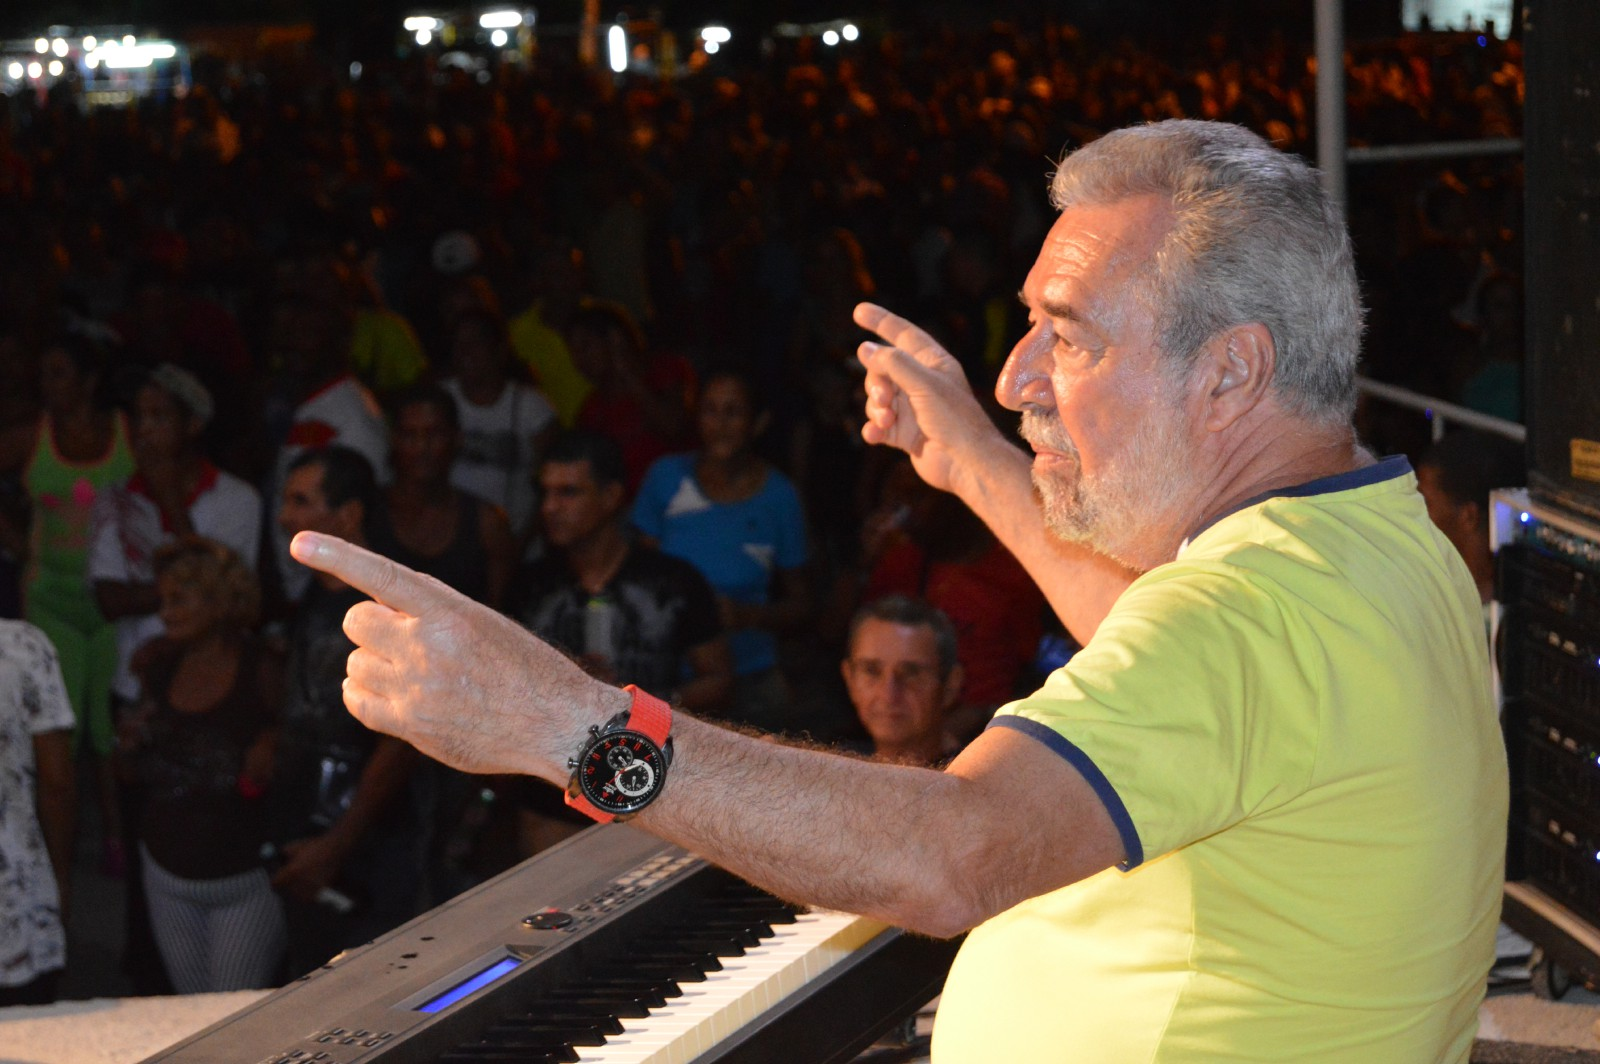 Dedican jornada de la cultura a la Original de Manzanillo